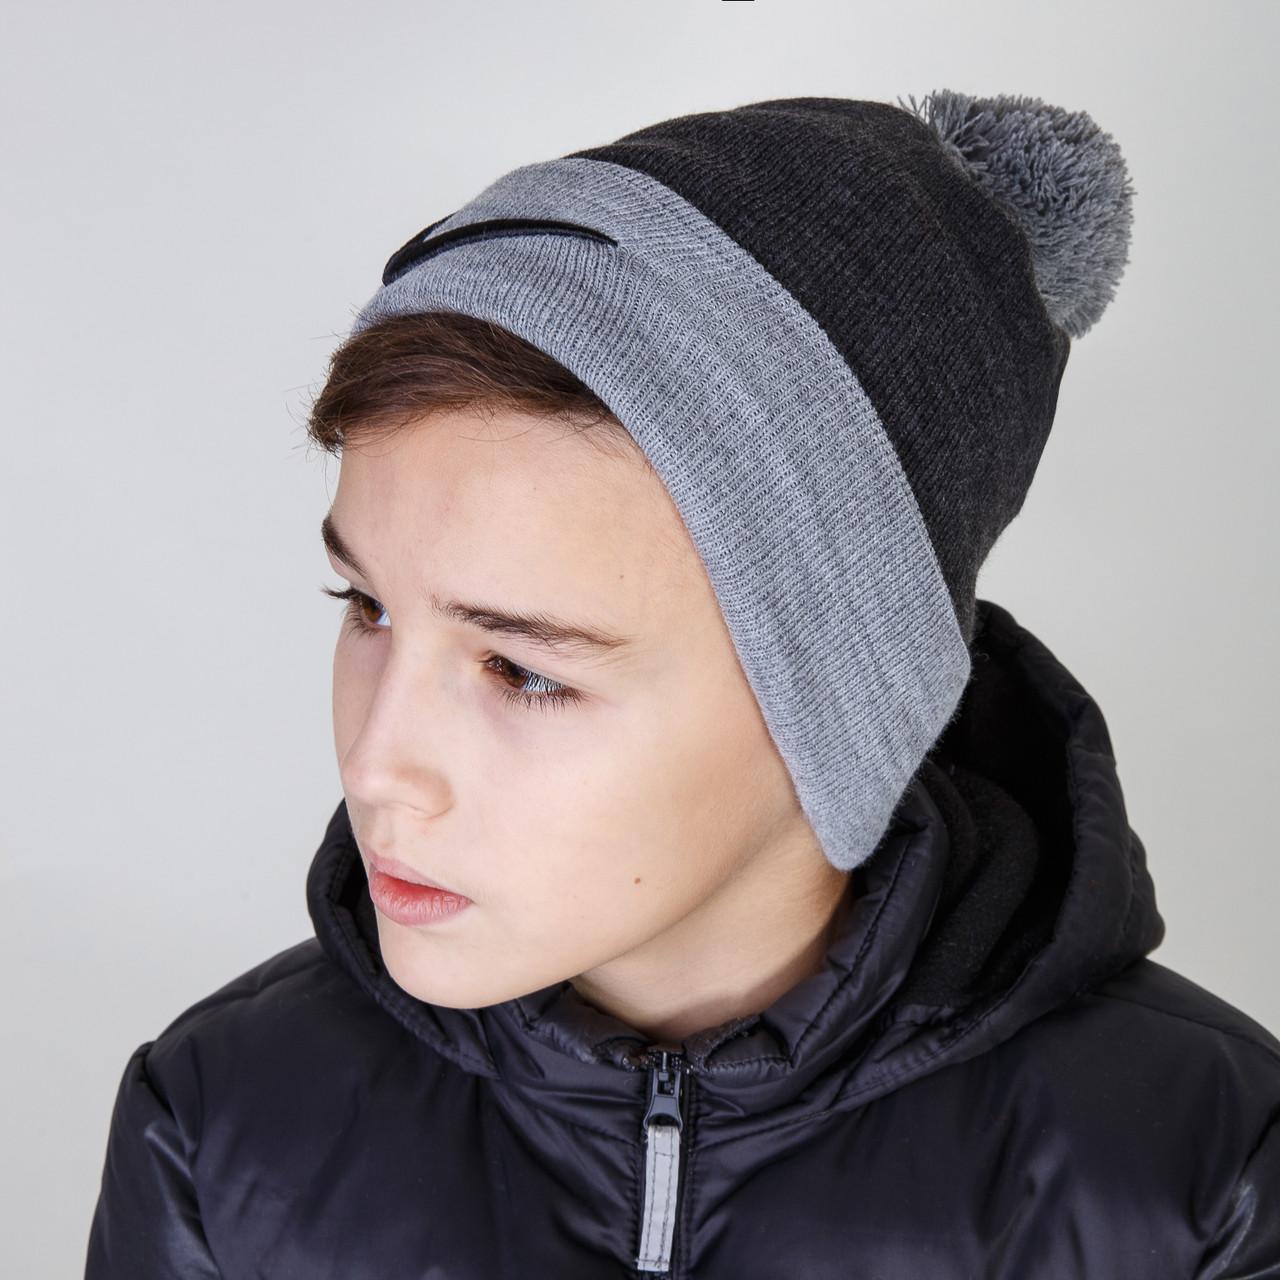 Спортивная зимняя шапка для мальчика с помпоном Nike (реплика) оптом - Артикул 2885